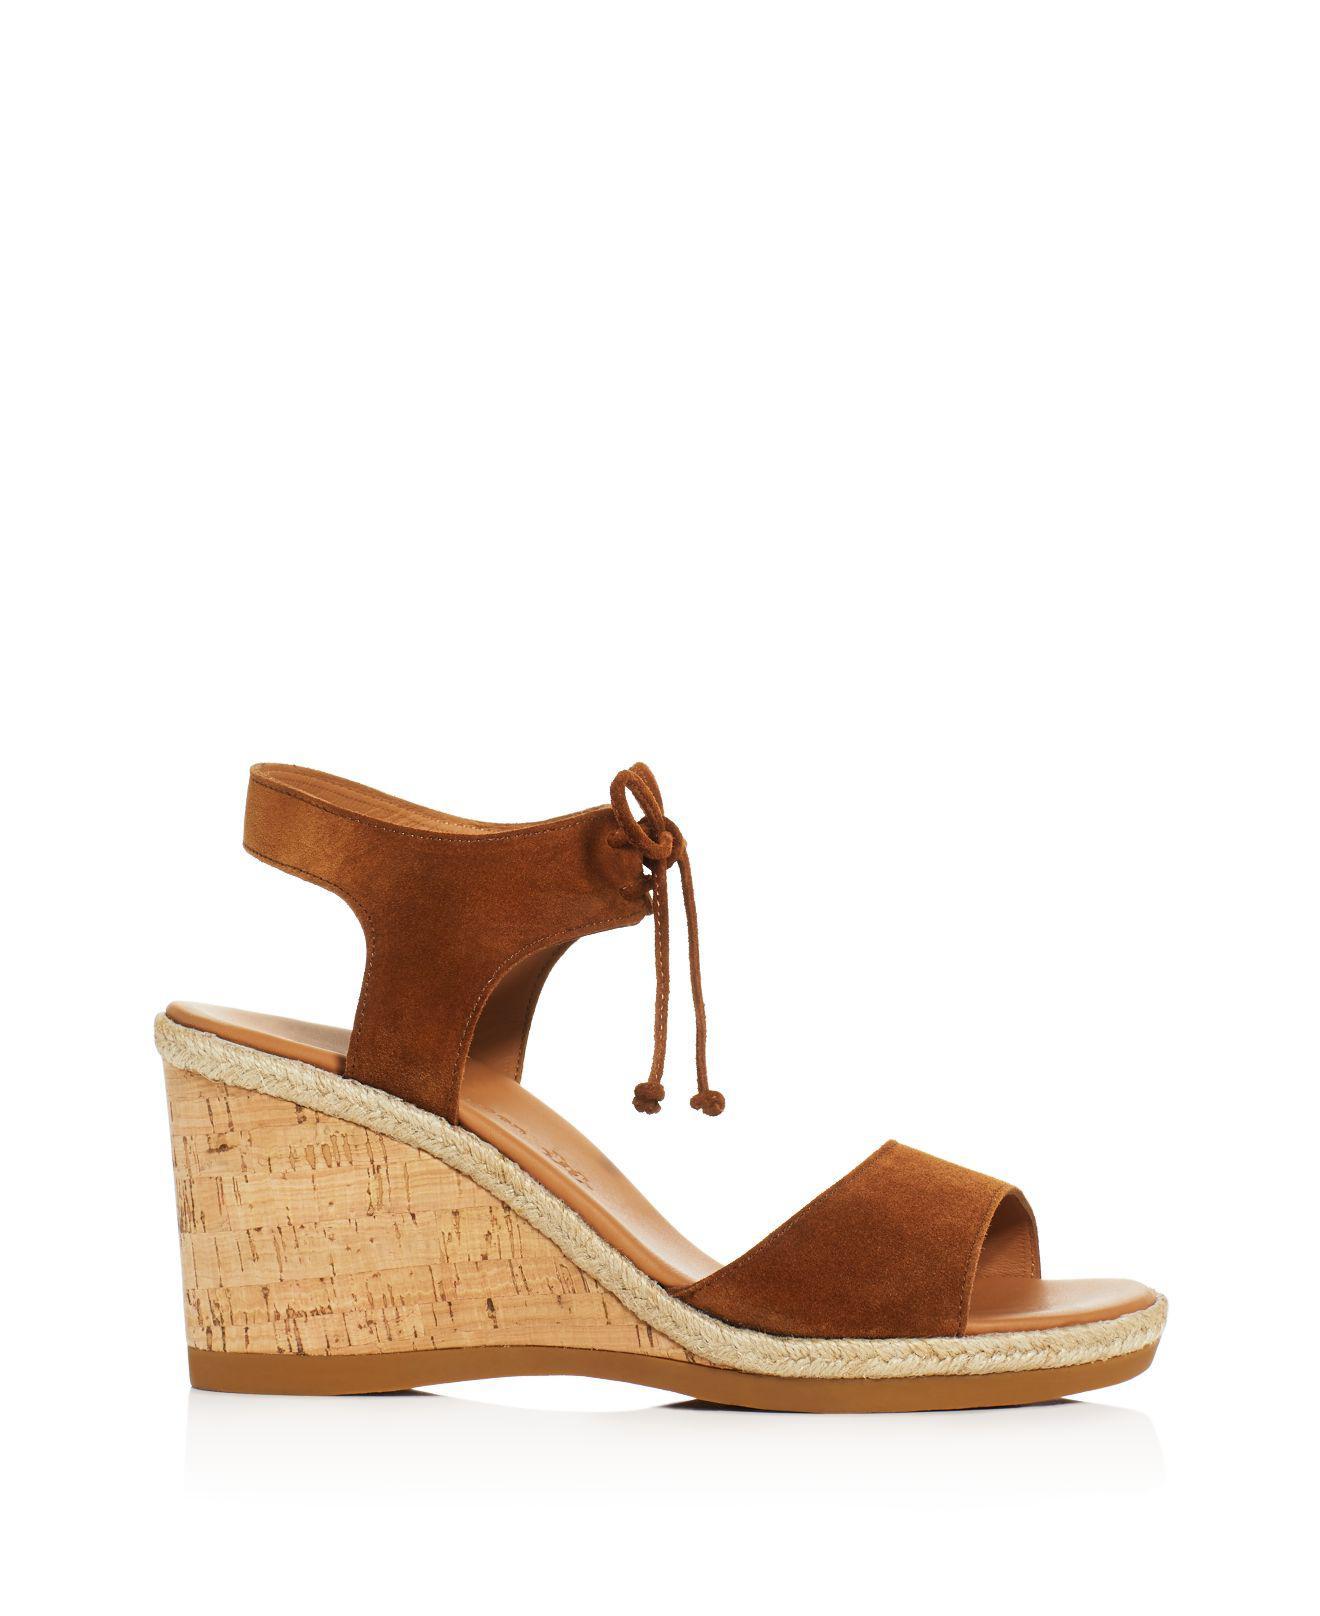 0de0acc6f4b Paul Green Melissa Wedge Sandals in Brown - Lyst